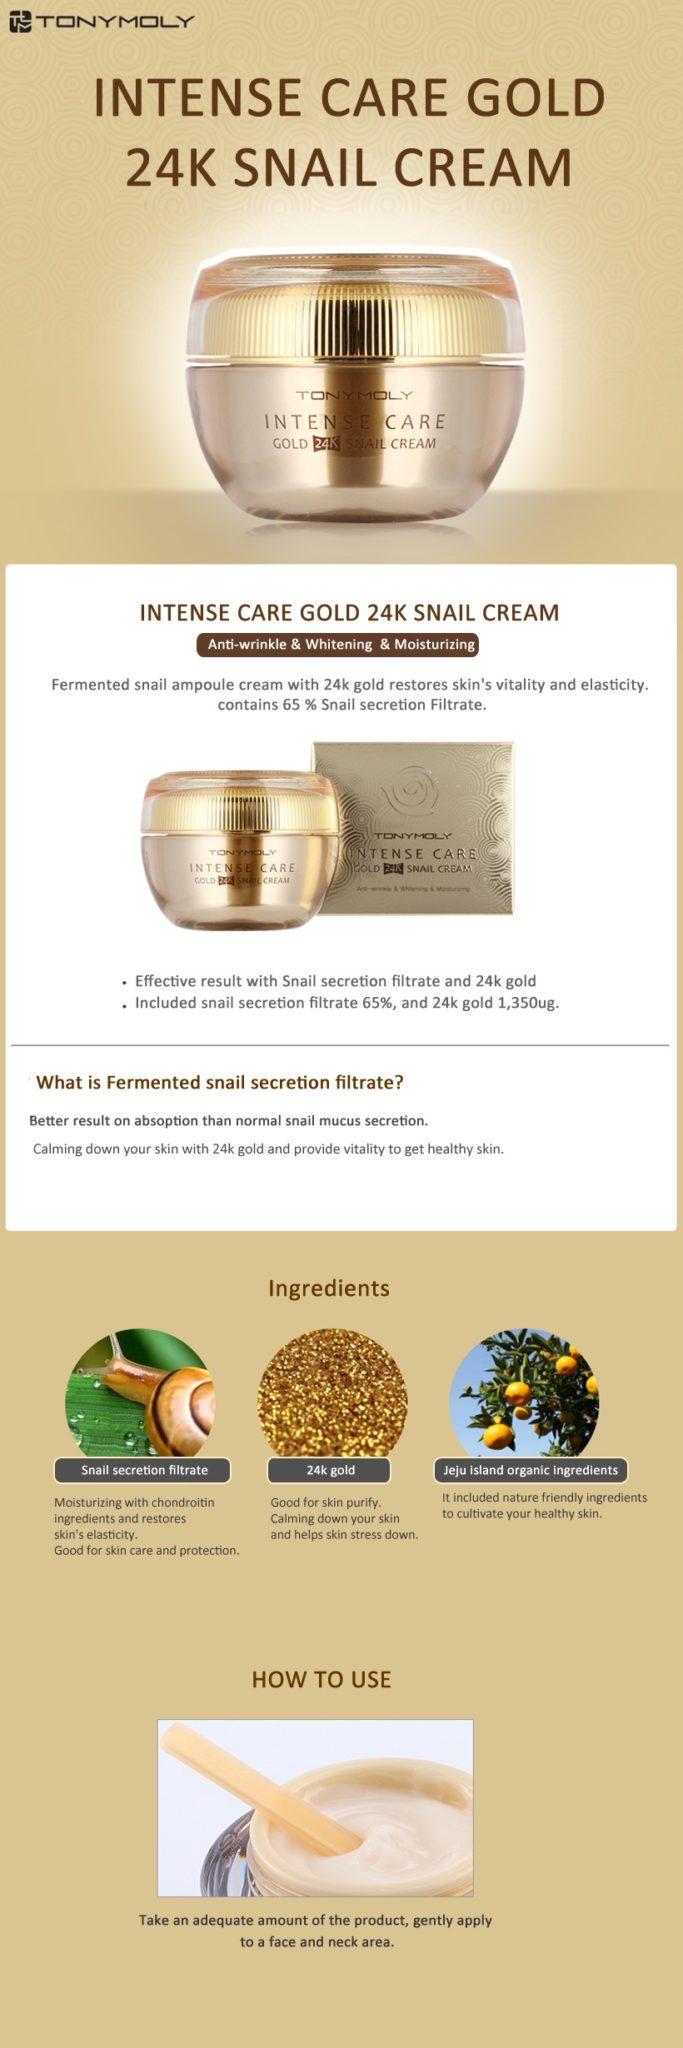 TONYMOLY Intense Care Gold 24K Snail Cream 45ml + TONYMOLY Intense Care Gold 24K Snail Cream  45ml